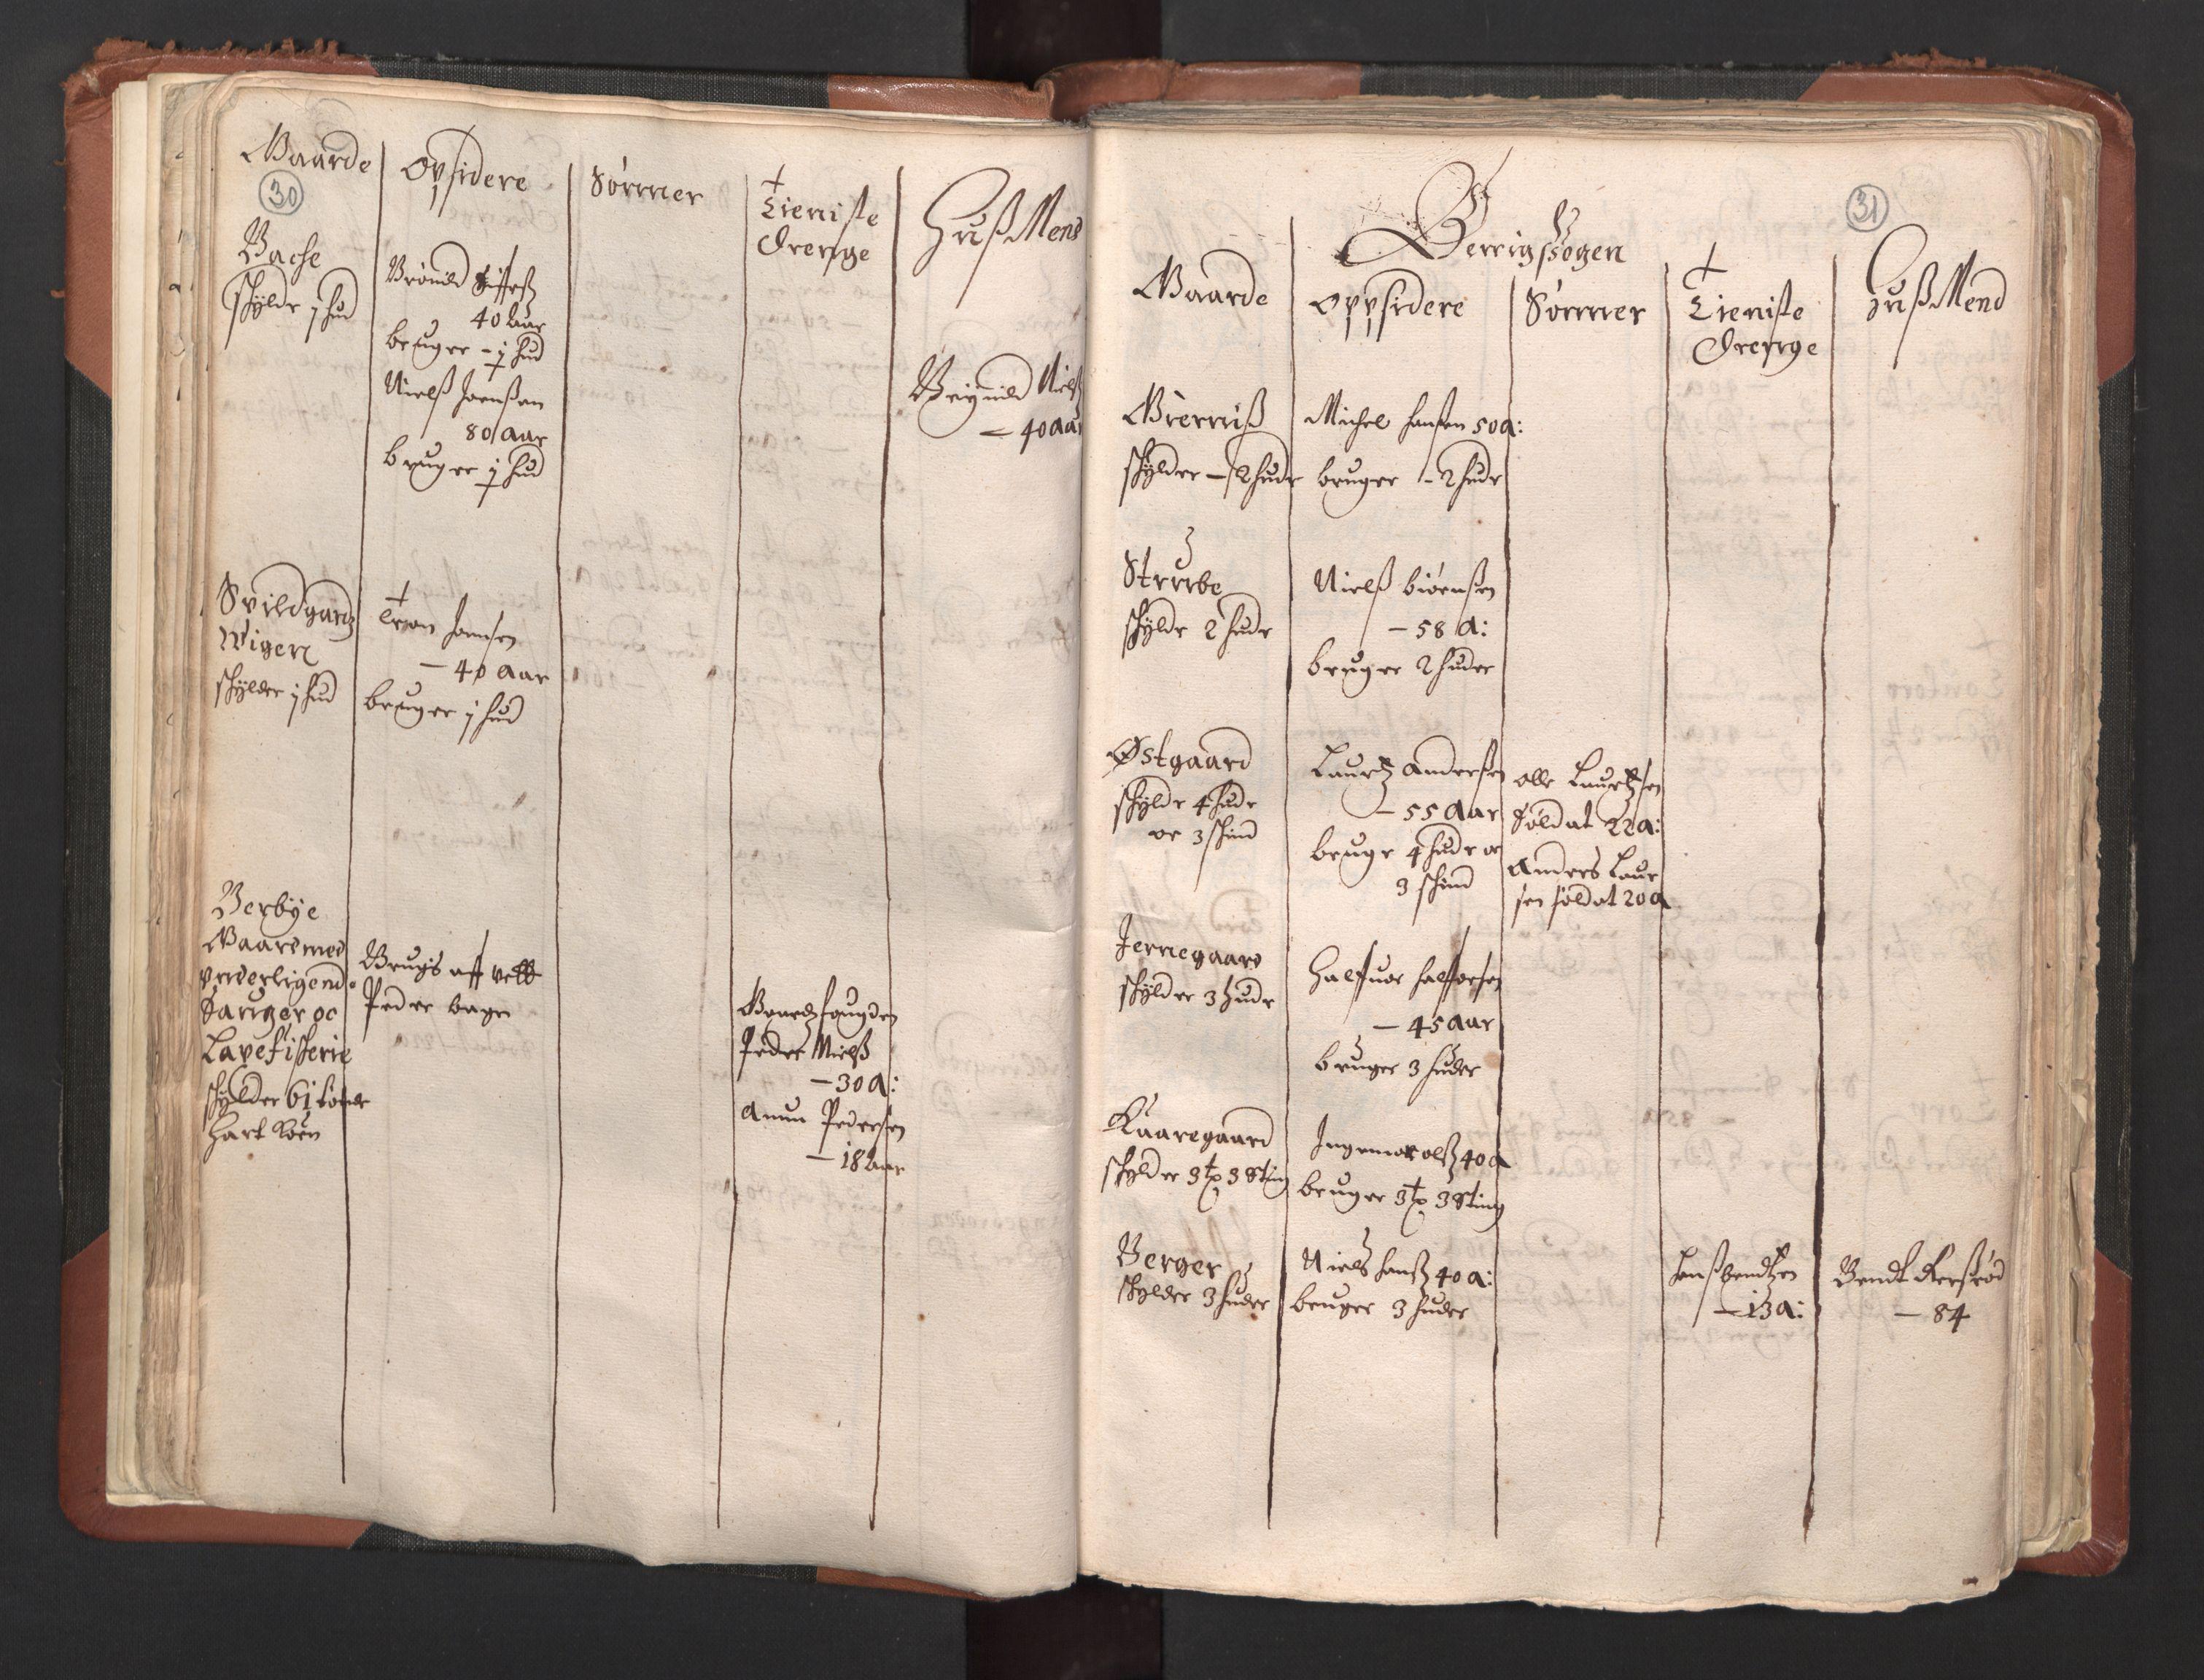 RA, Fogdenes og sorenskrivernes manntall 1664-1666, nr. 1: Fogderier (len og skipreider) i nåværende Østfold fylke, 1664, s. 30-31